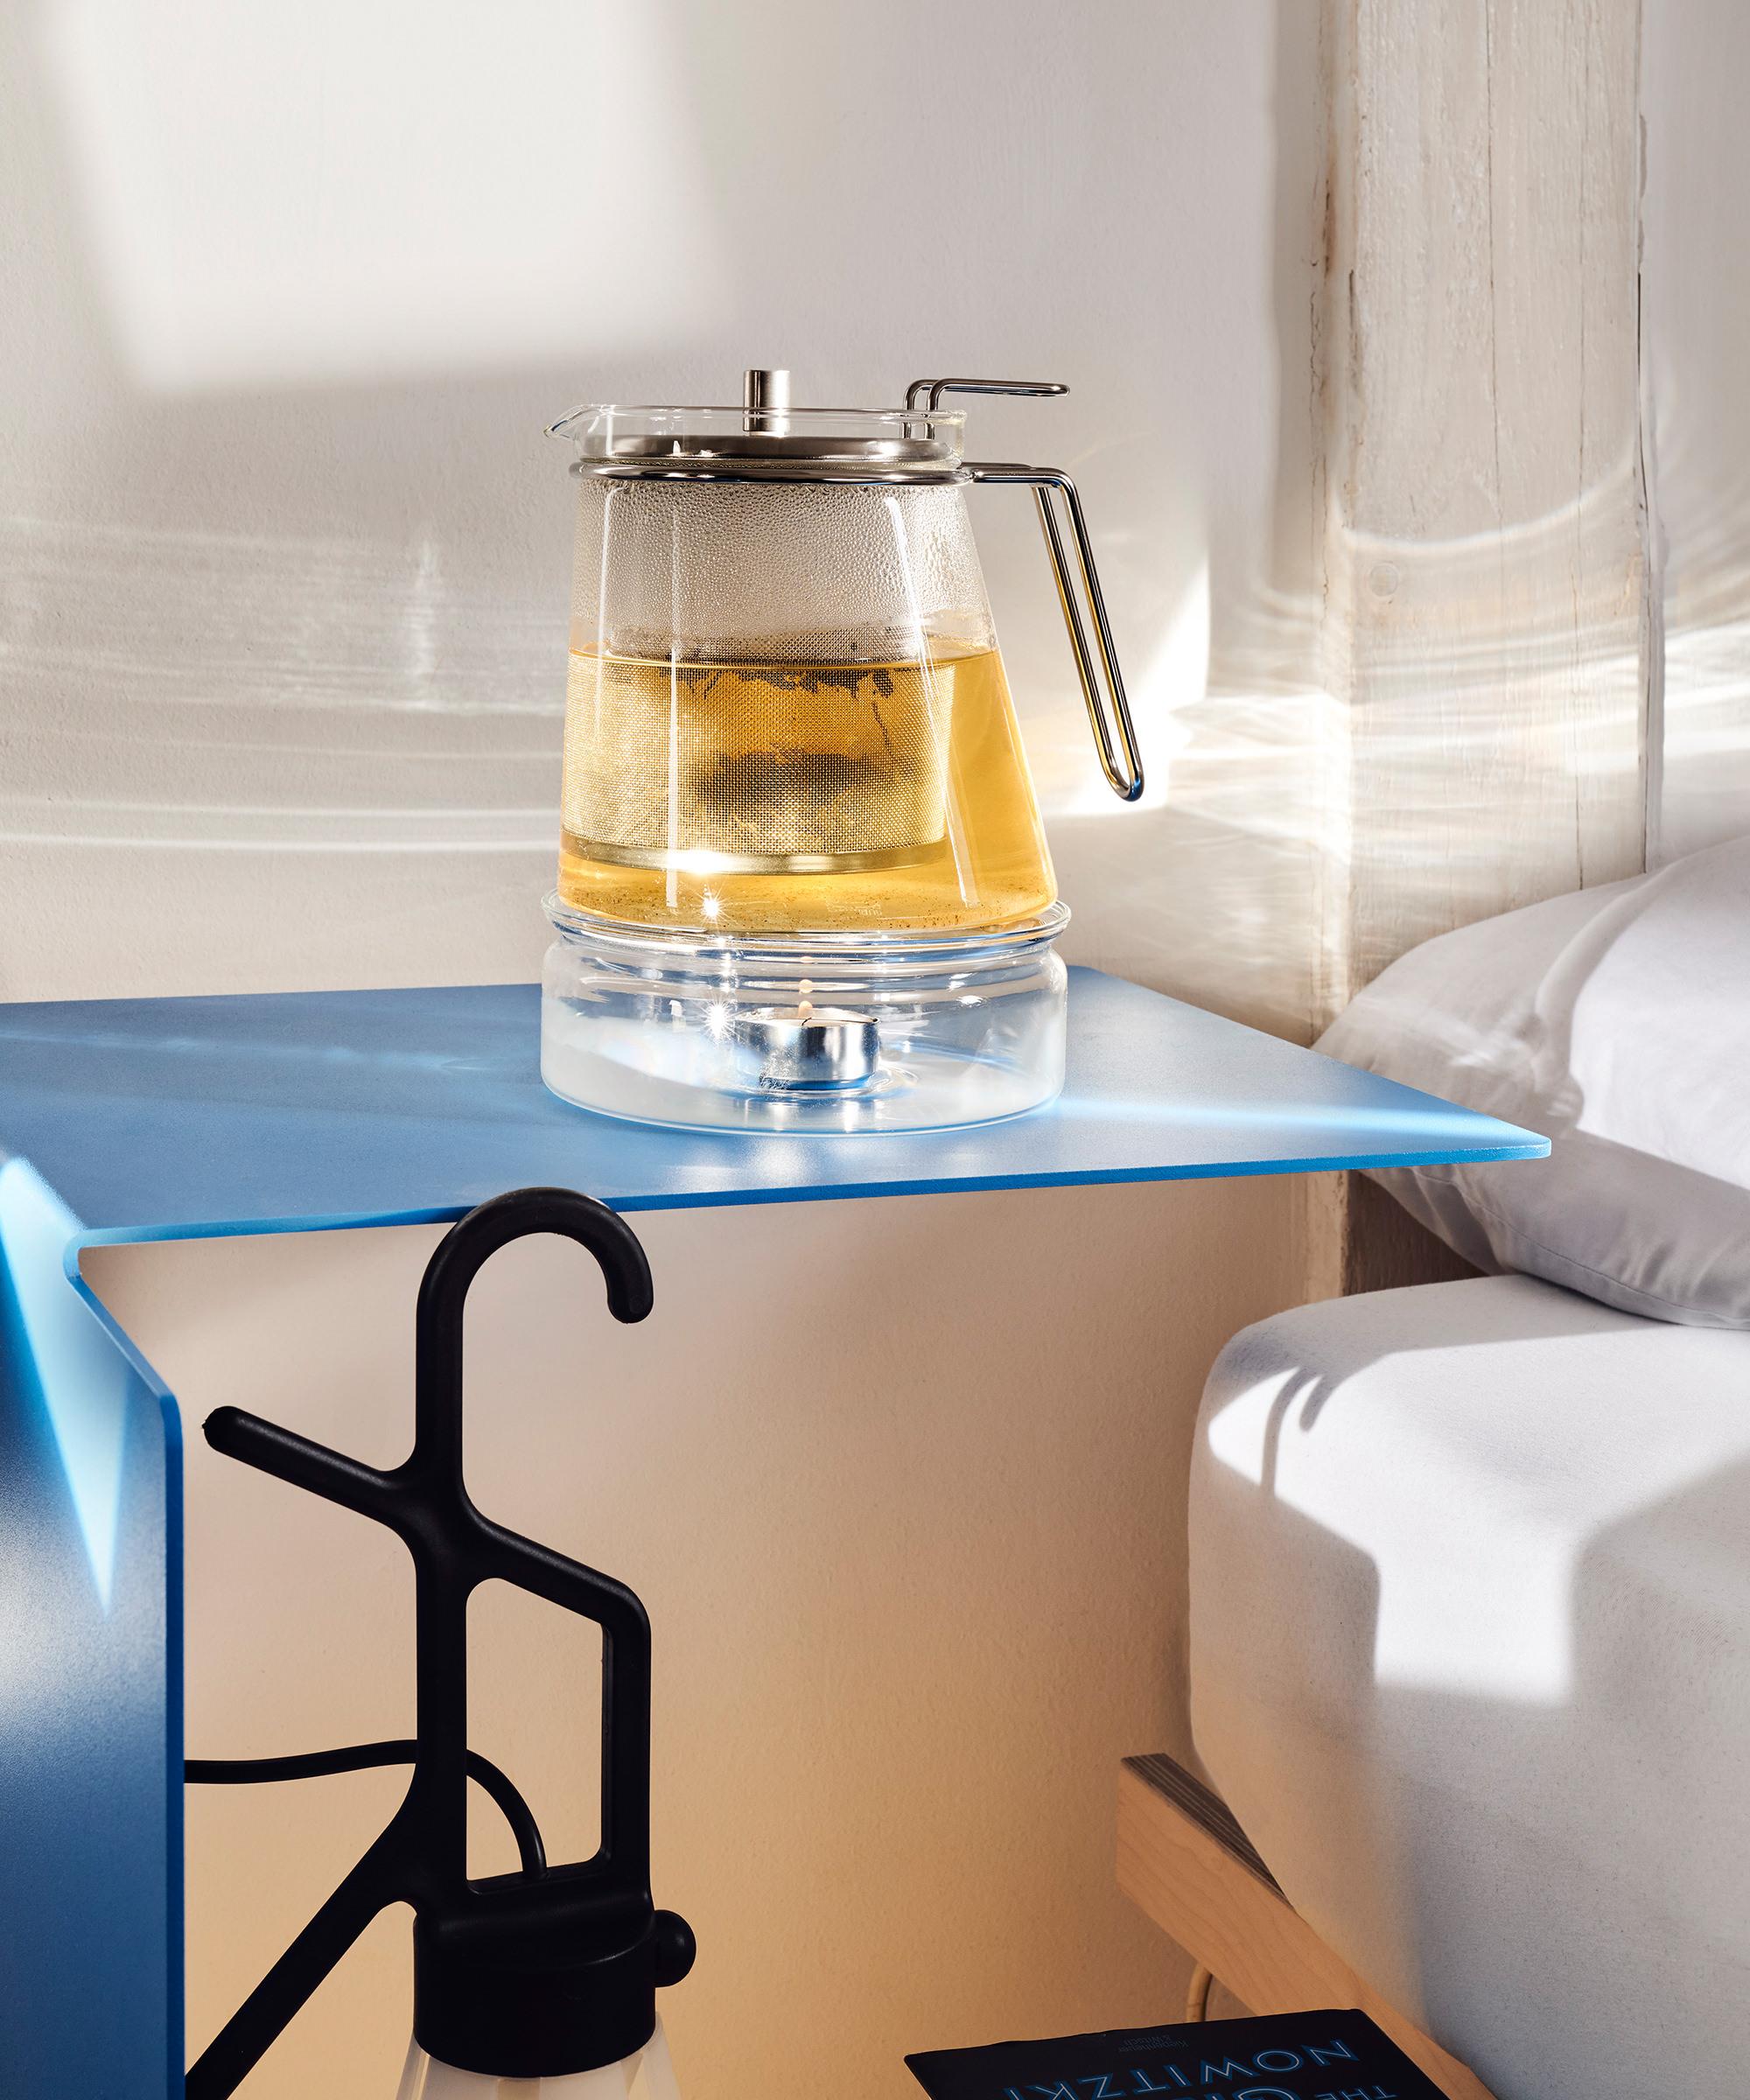 33300 Mono Ellipse Teekanne Teapot 01